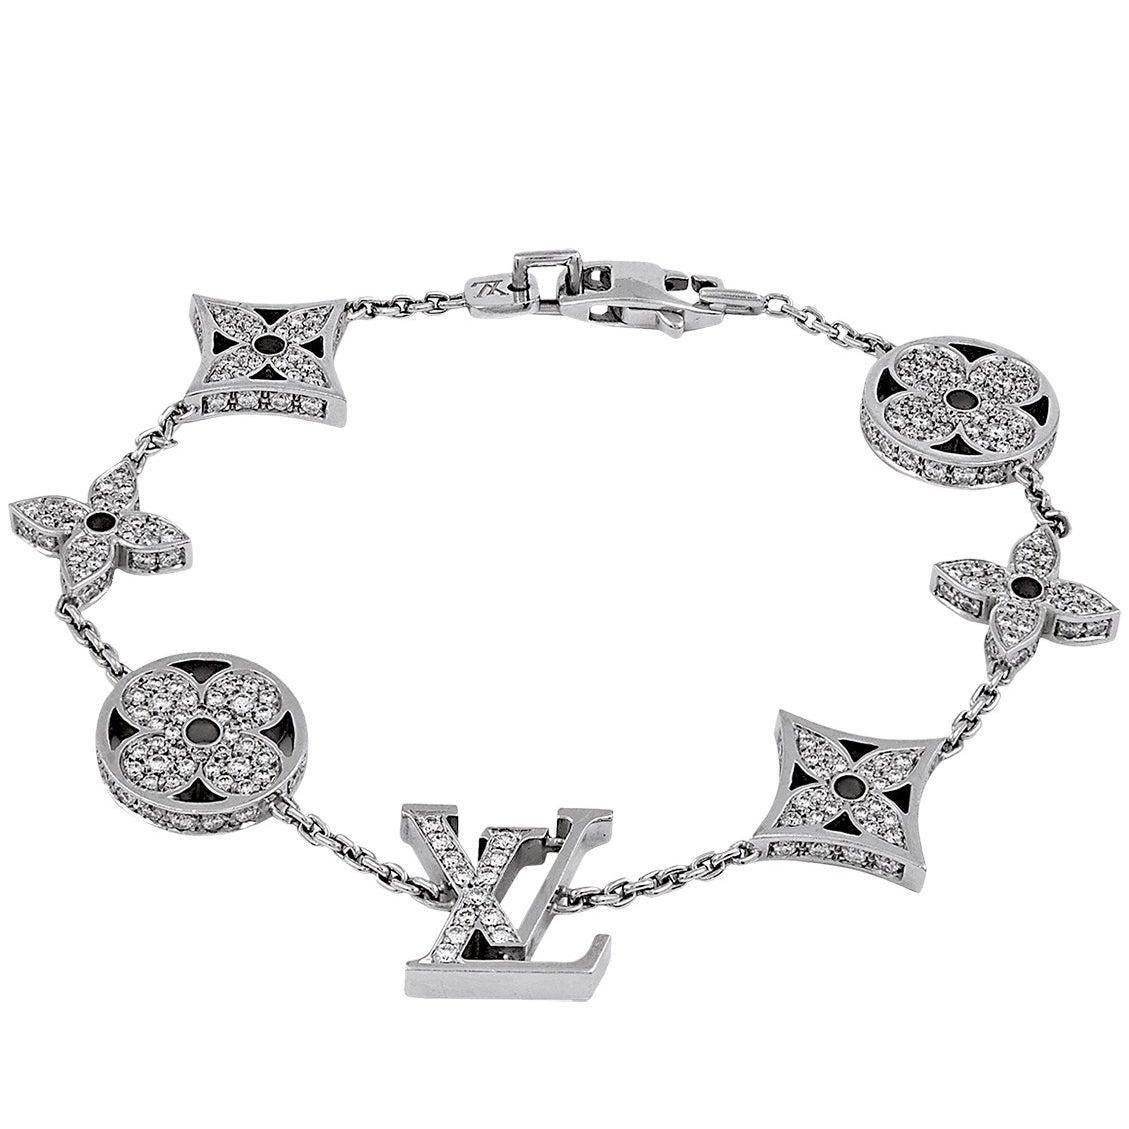 Louis Vuitton Diamond Monogram Bracelet